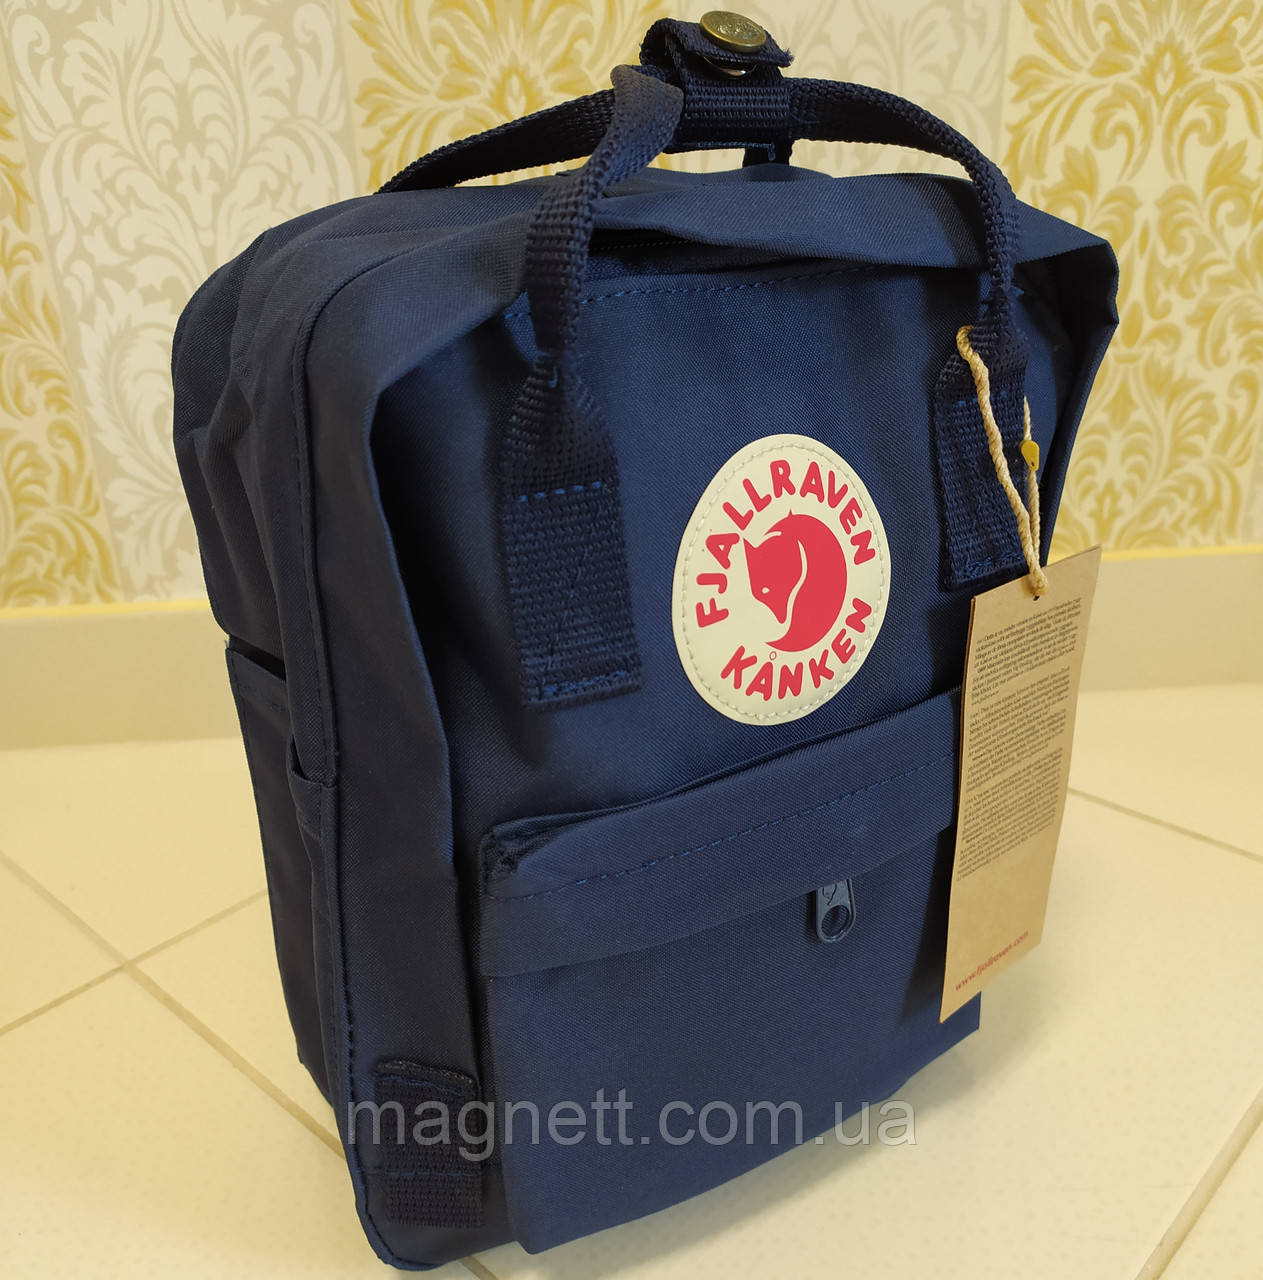 Рюкзак FJALLRAVEN Kanken Mini для детей и взрослых 27x22x9 (темно-синий)